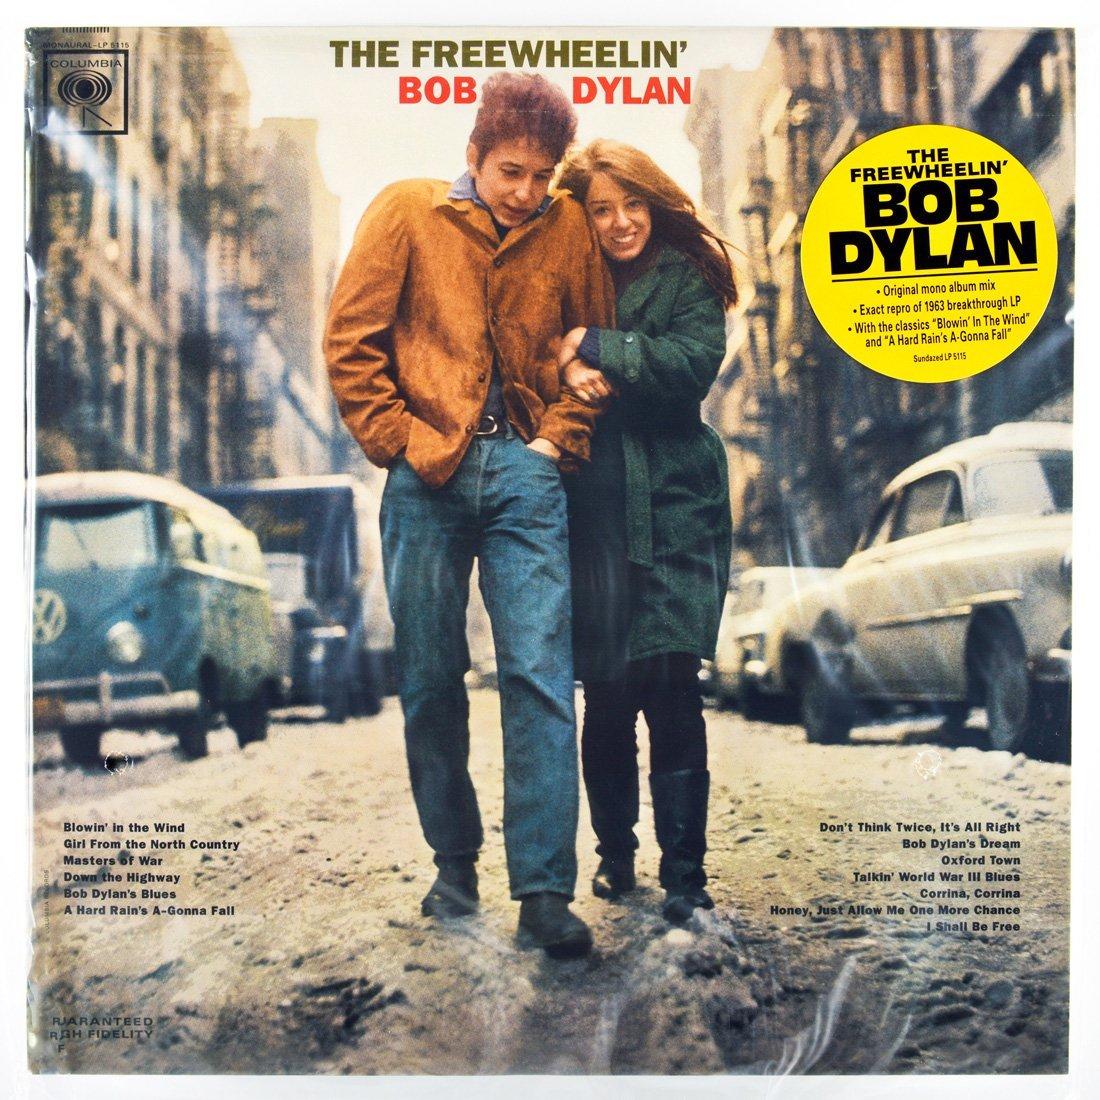 American Highway Framed Print by Bob Dylan